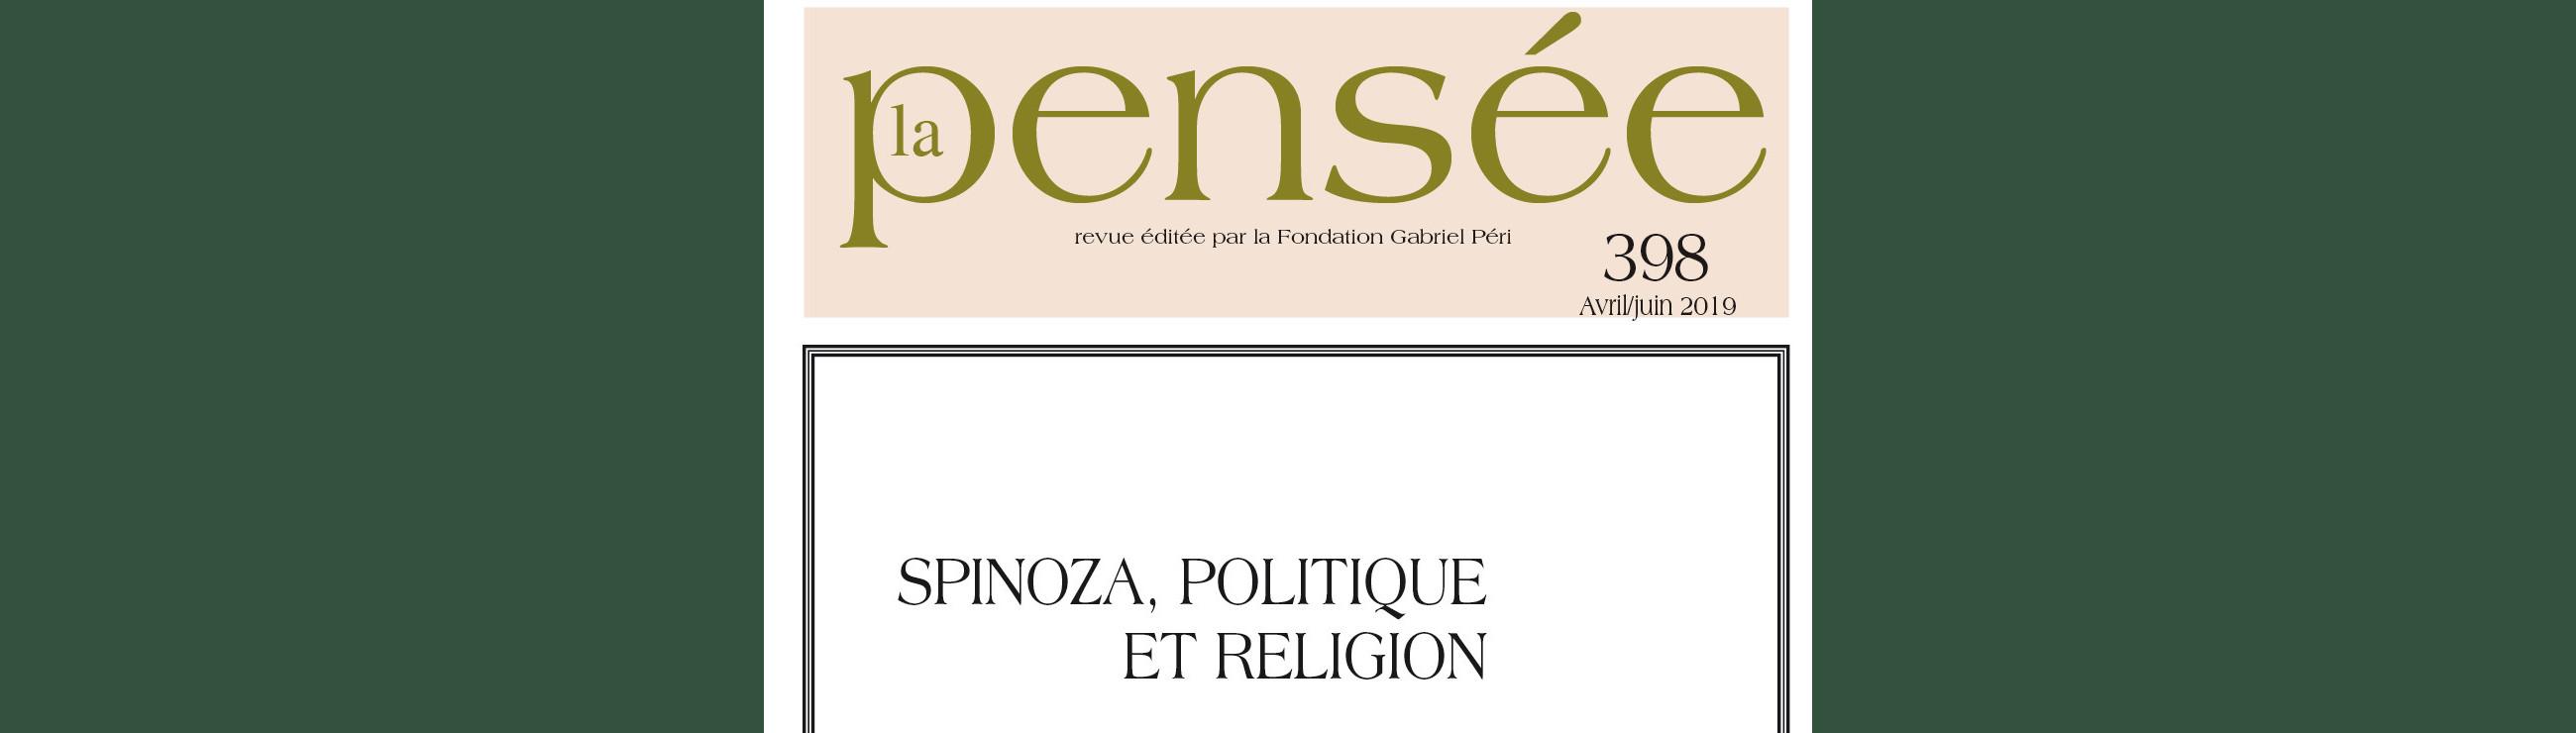 Spinoza, politique et religion